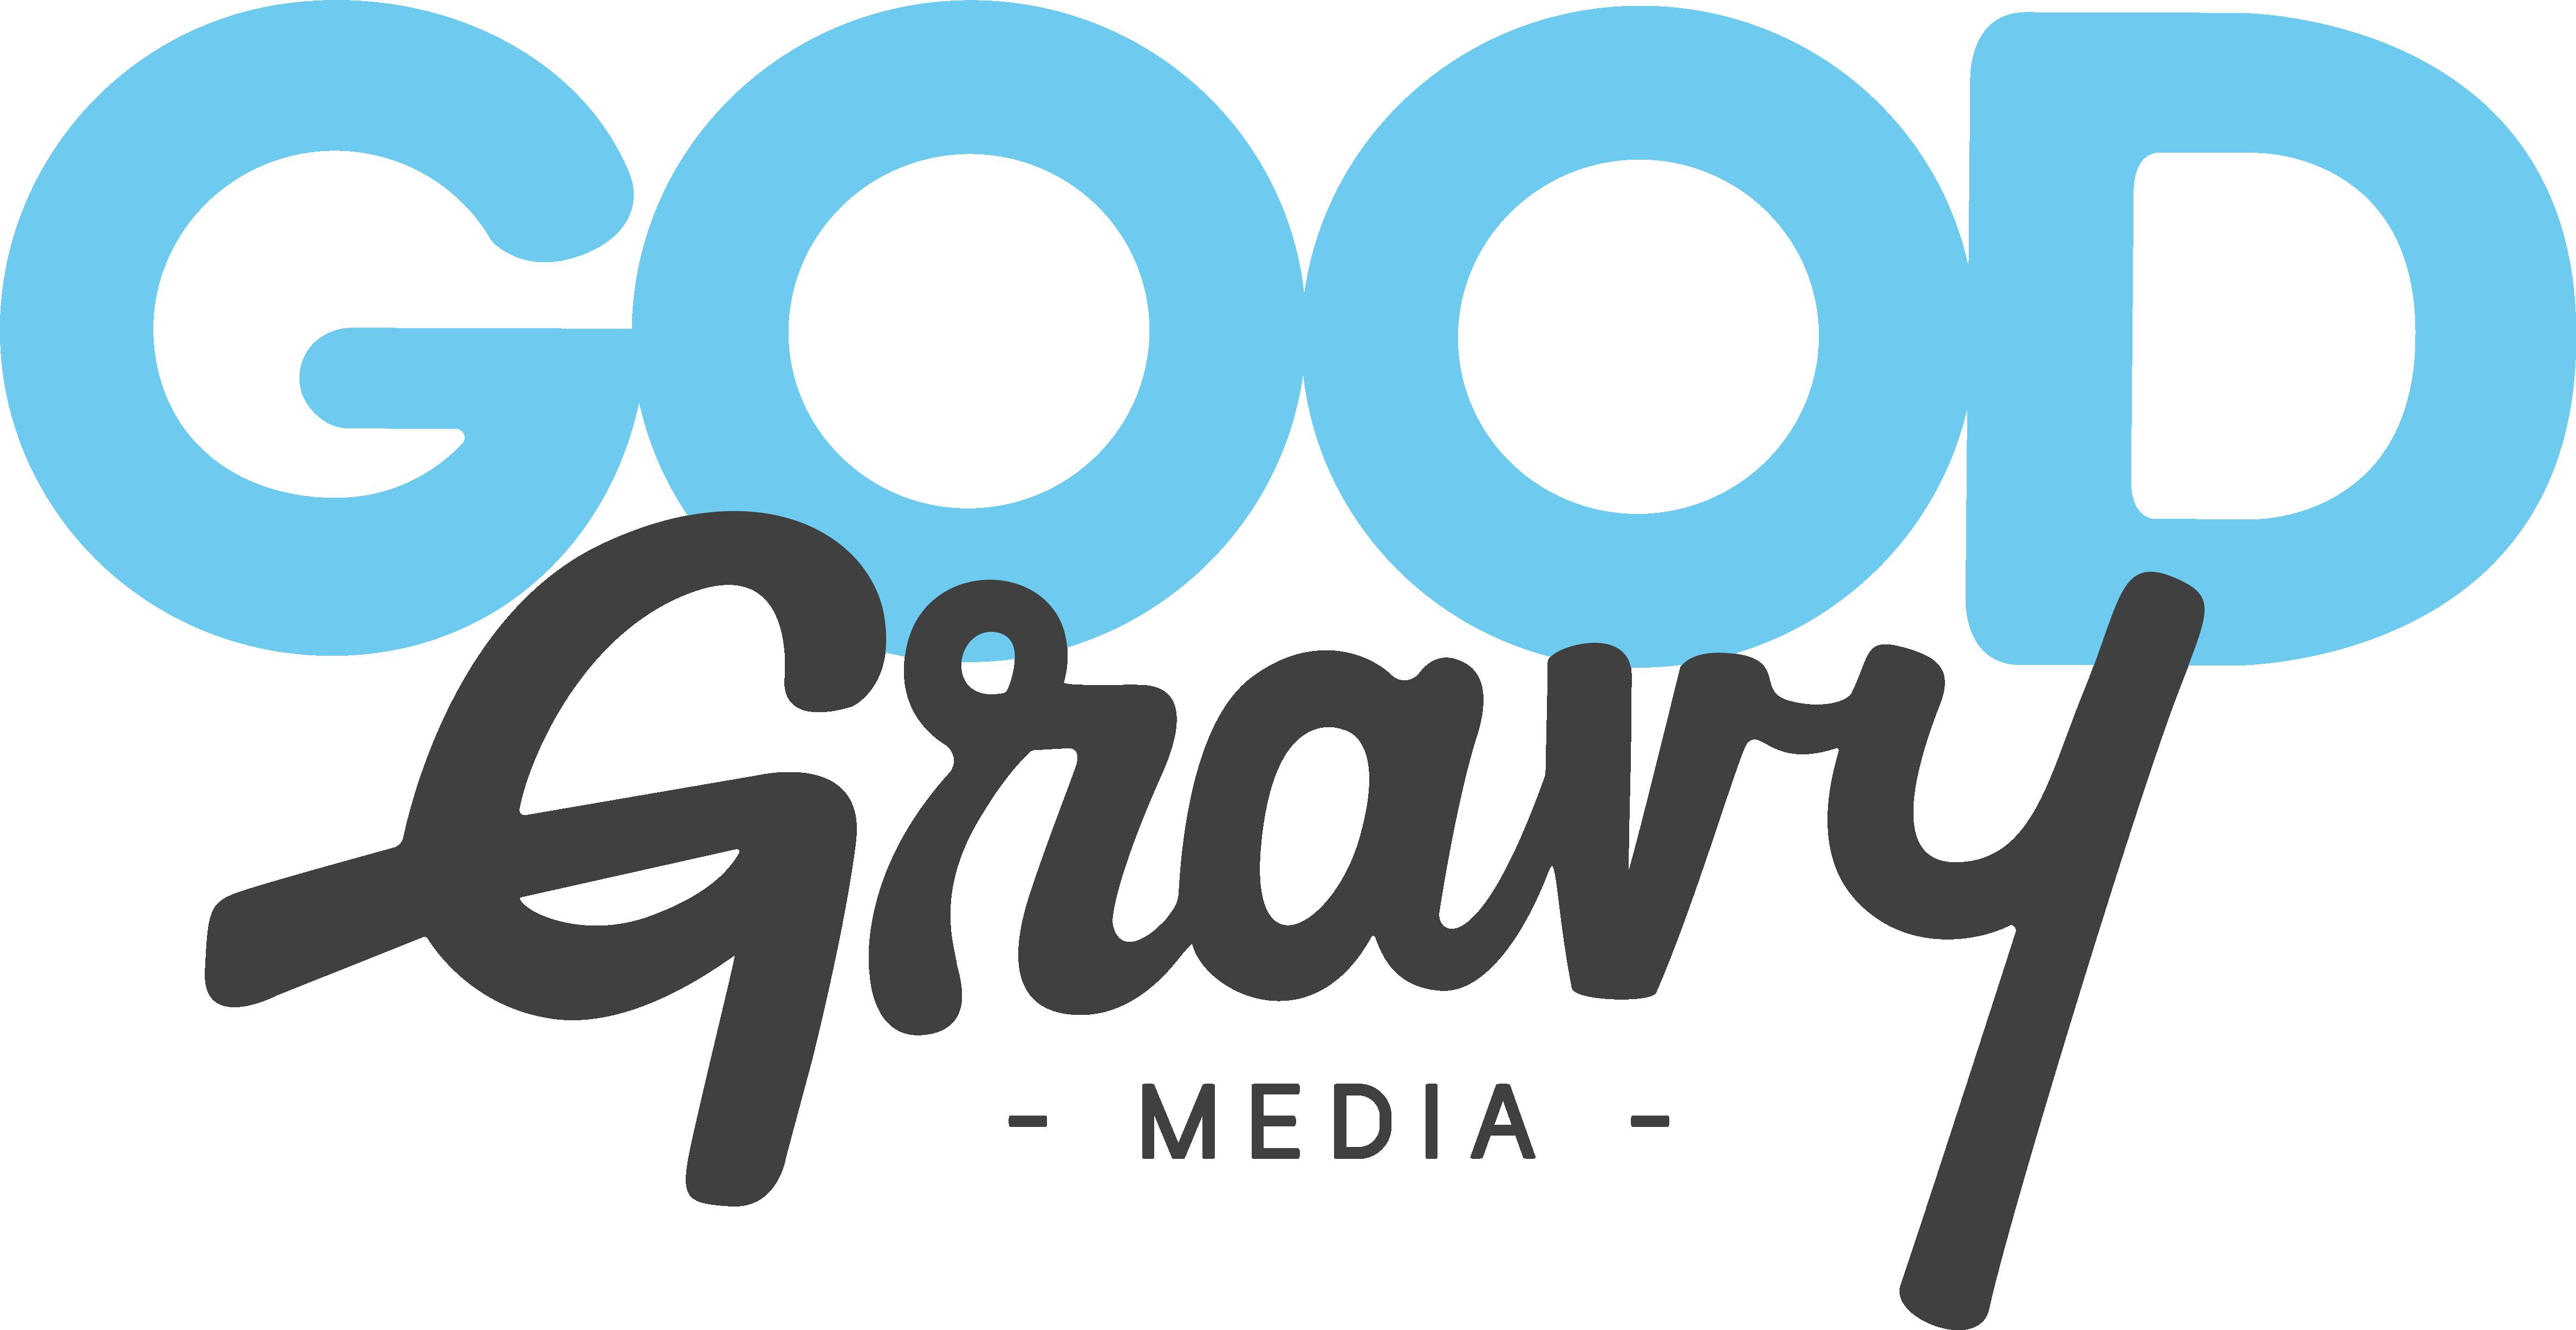 Good Gravy Media